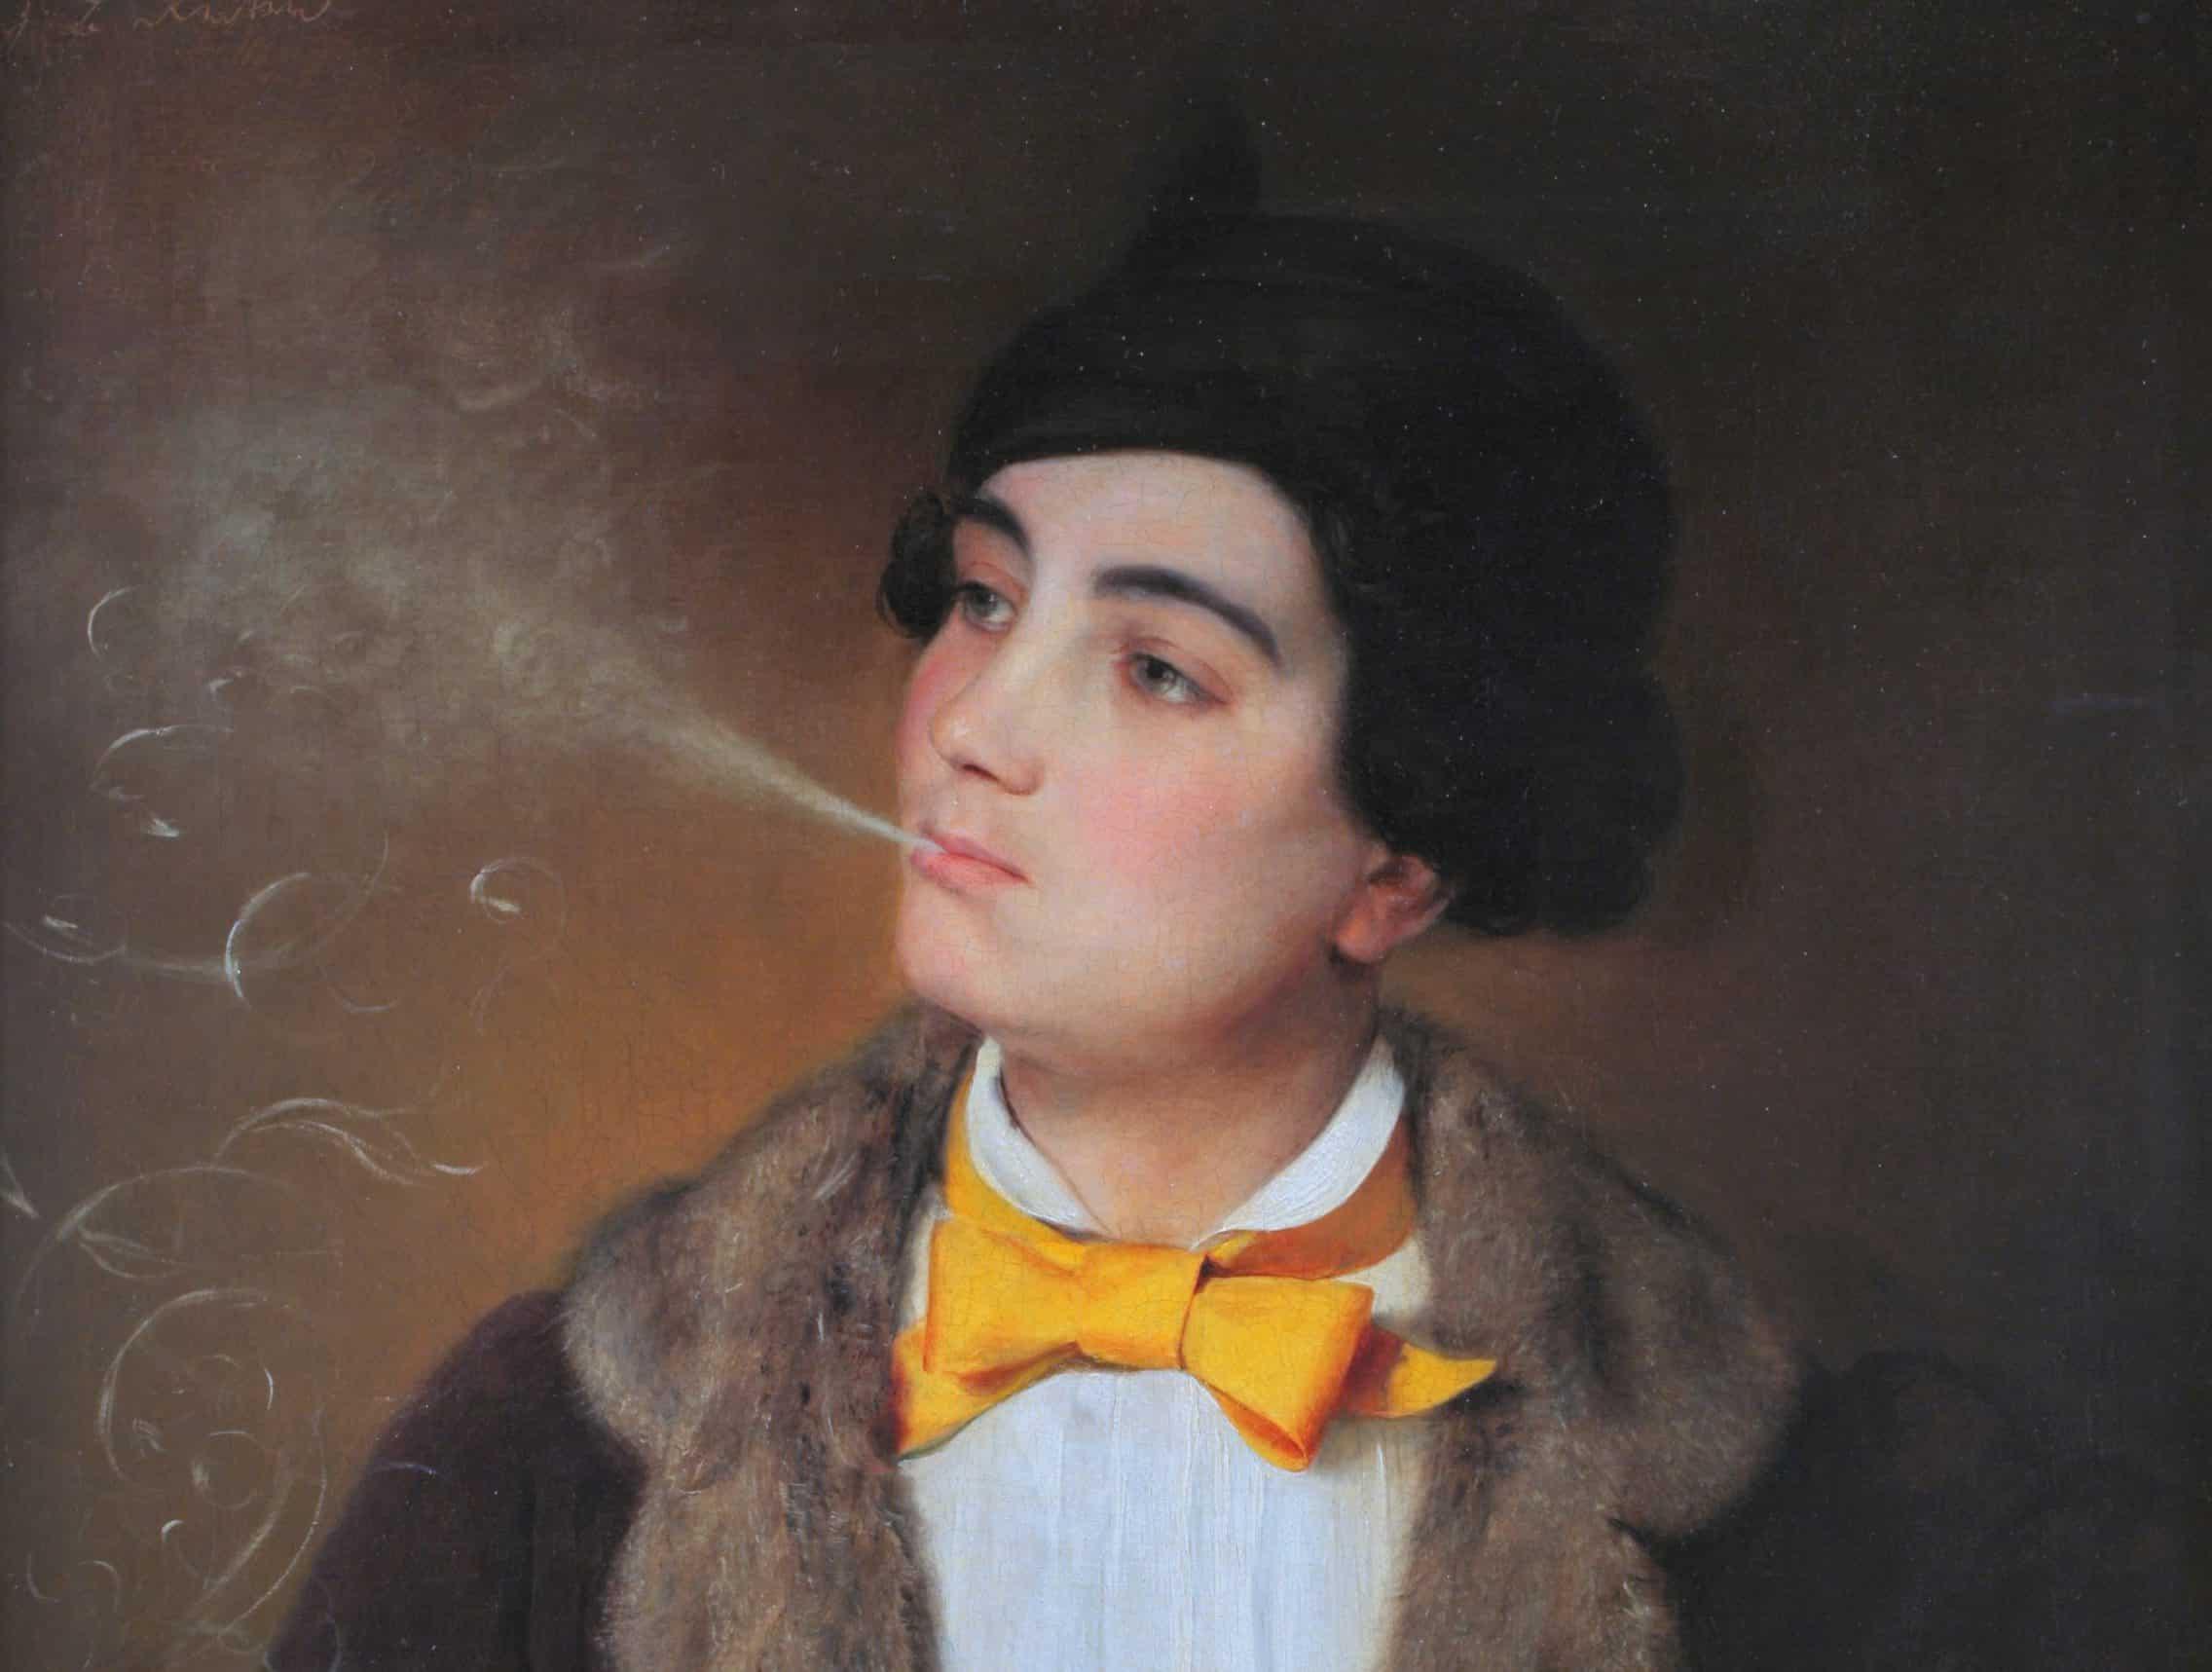 Louise Aston by Johann Baptist Reiter e1520123653318 لويز أستون - إلى النِّسـاء